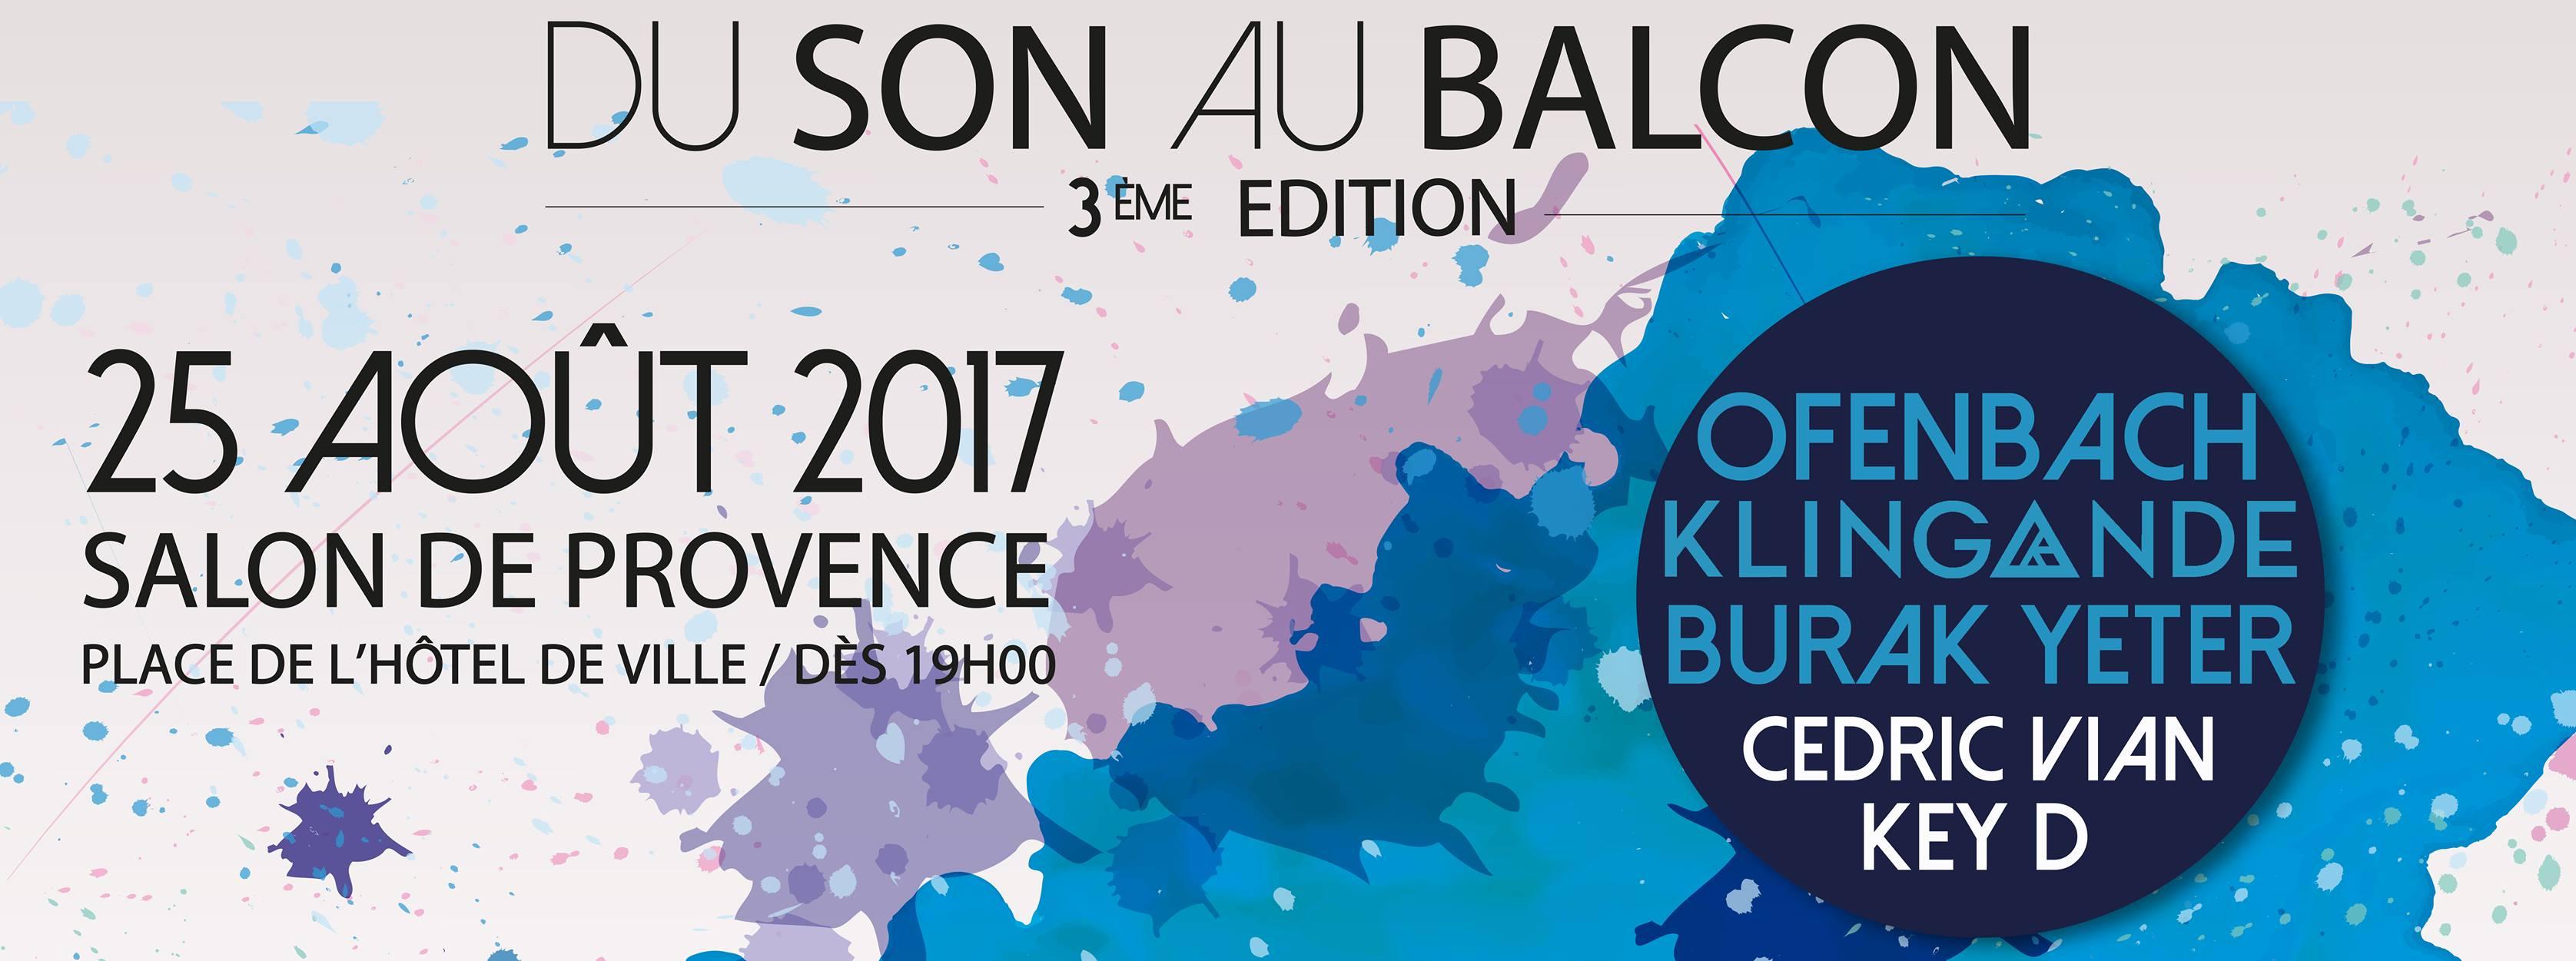 Du Son Au Balcon